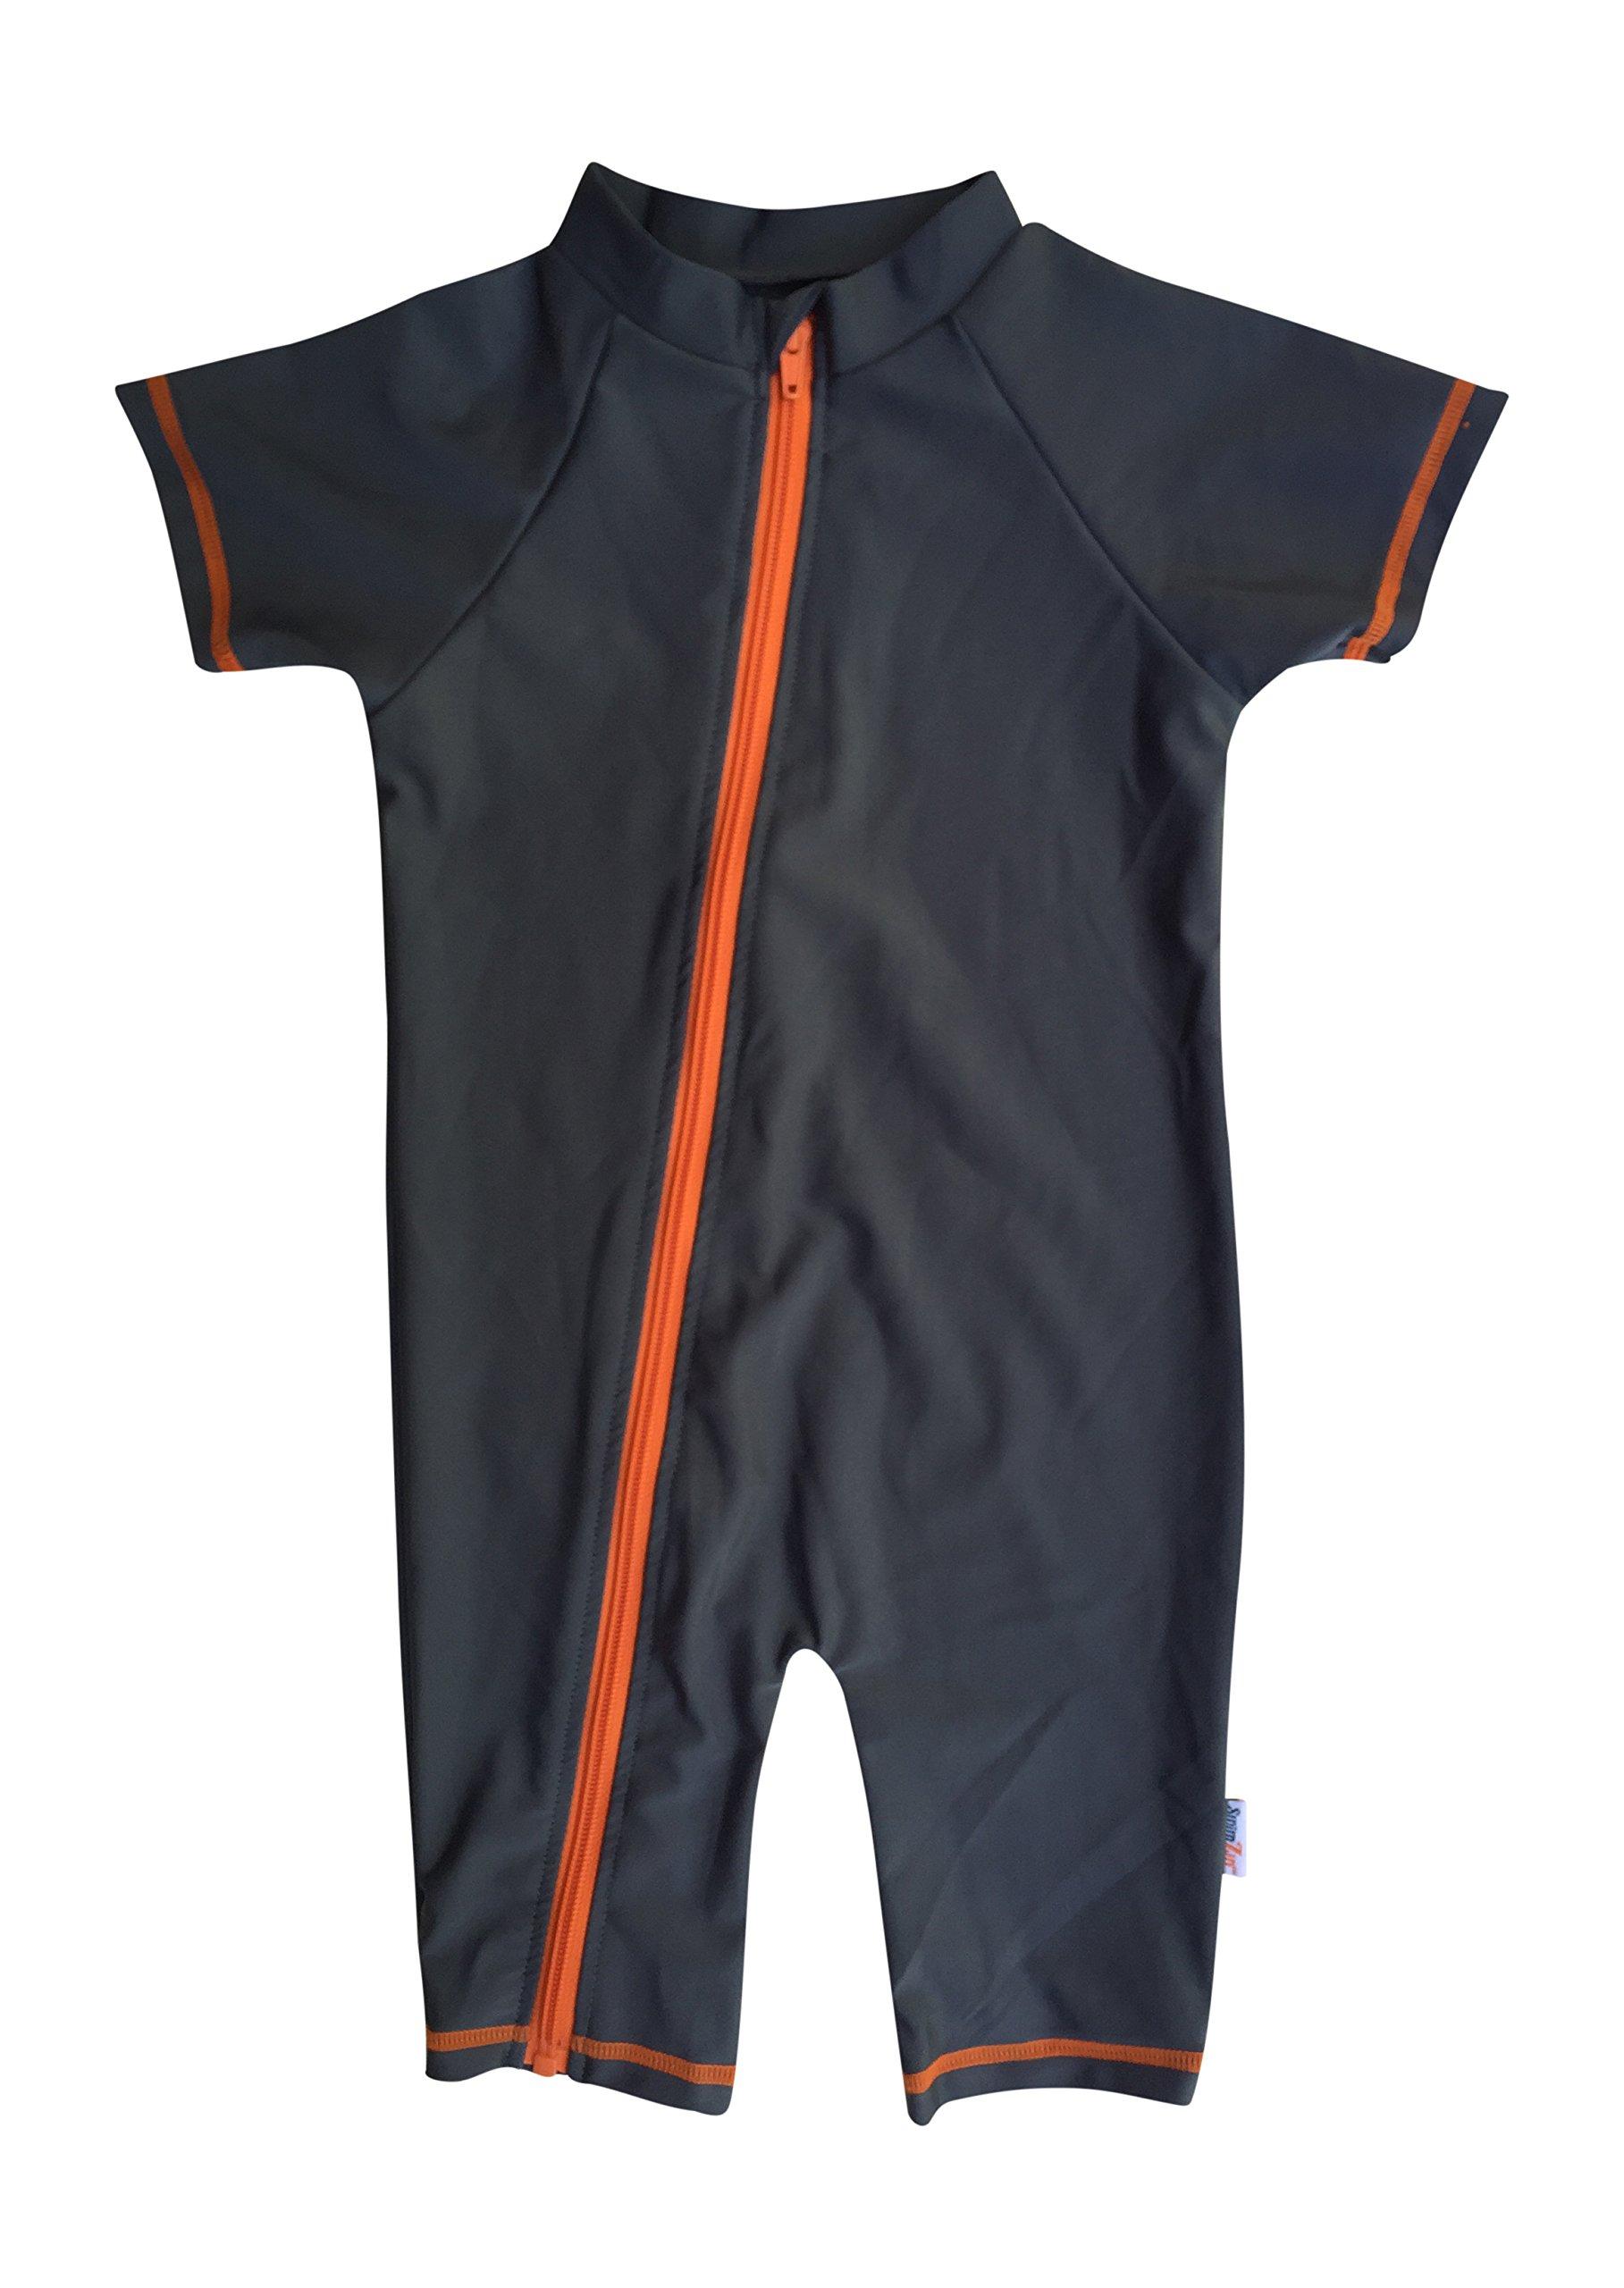 Best Rated in Baby Boys Swimwear Sunsuits & Helpful Customer